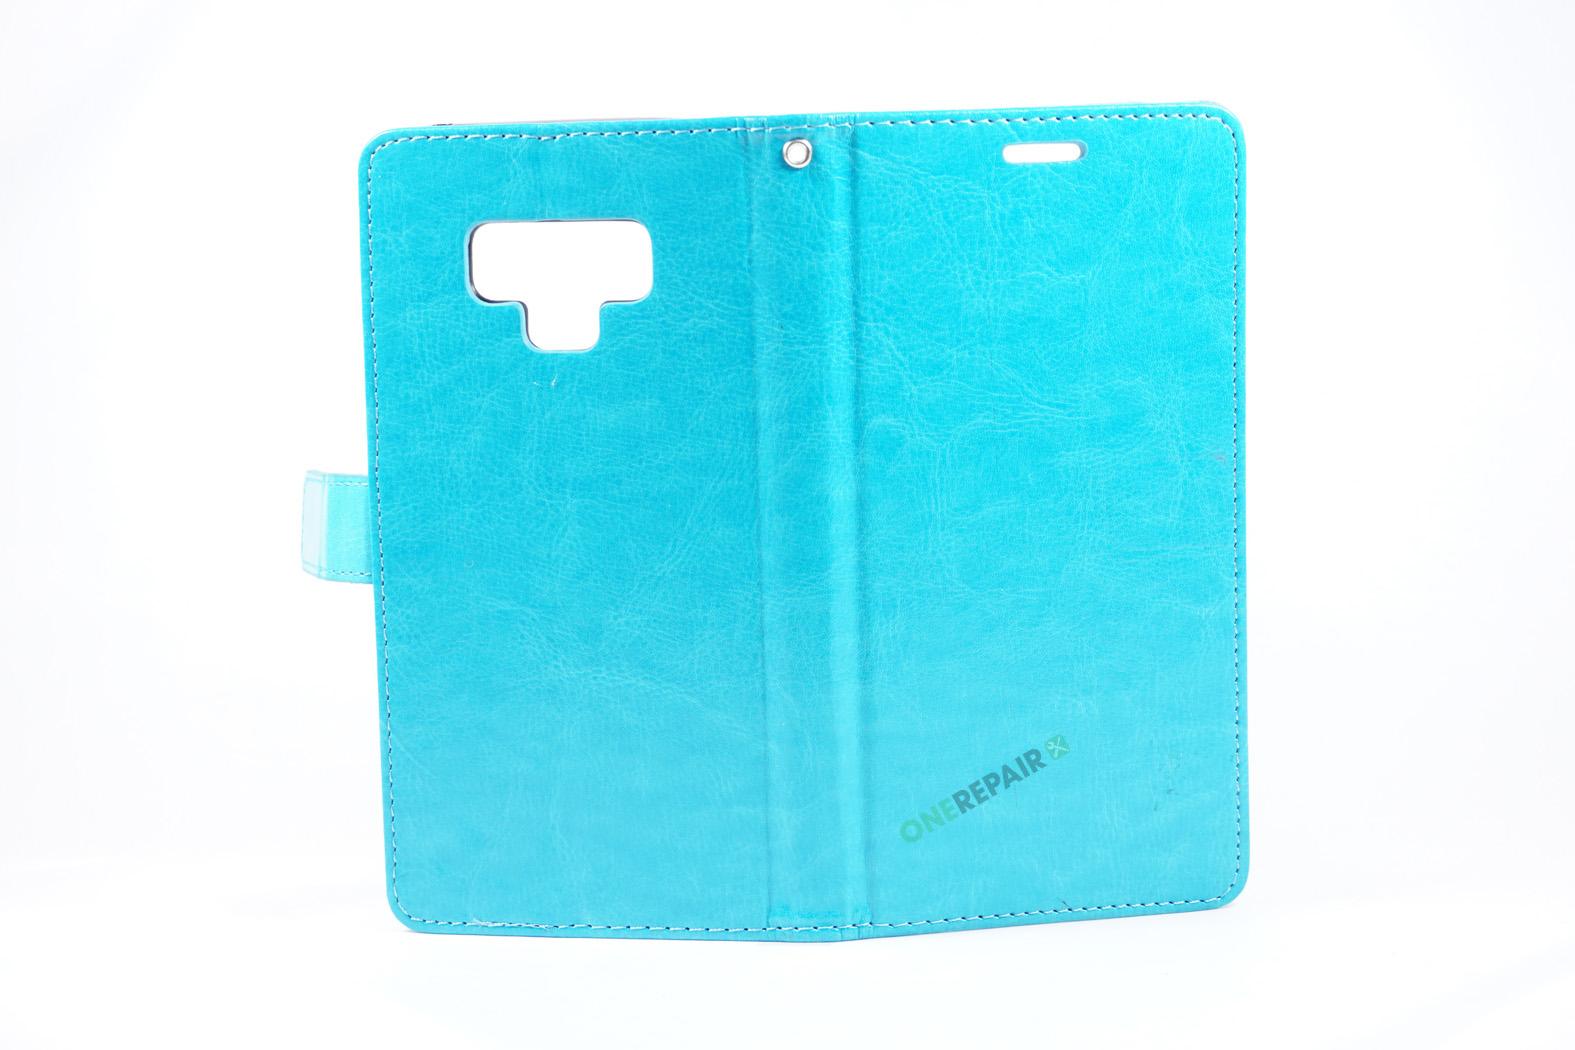 351894_Samsung_Note_9_Flipcover_Classic_Cover_Turkis_Blaa_OneRepair_00003